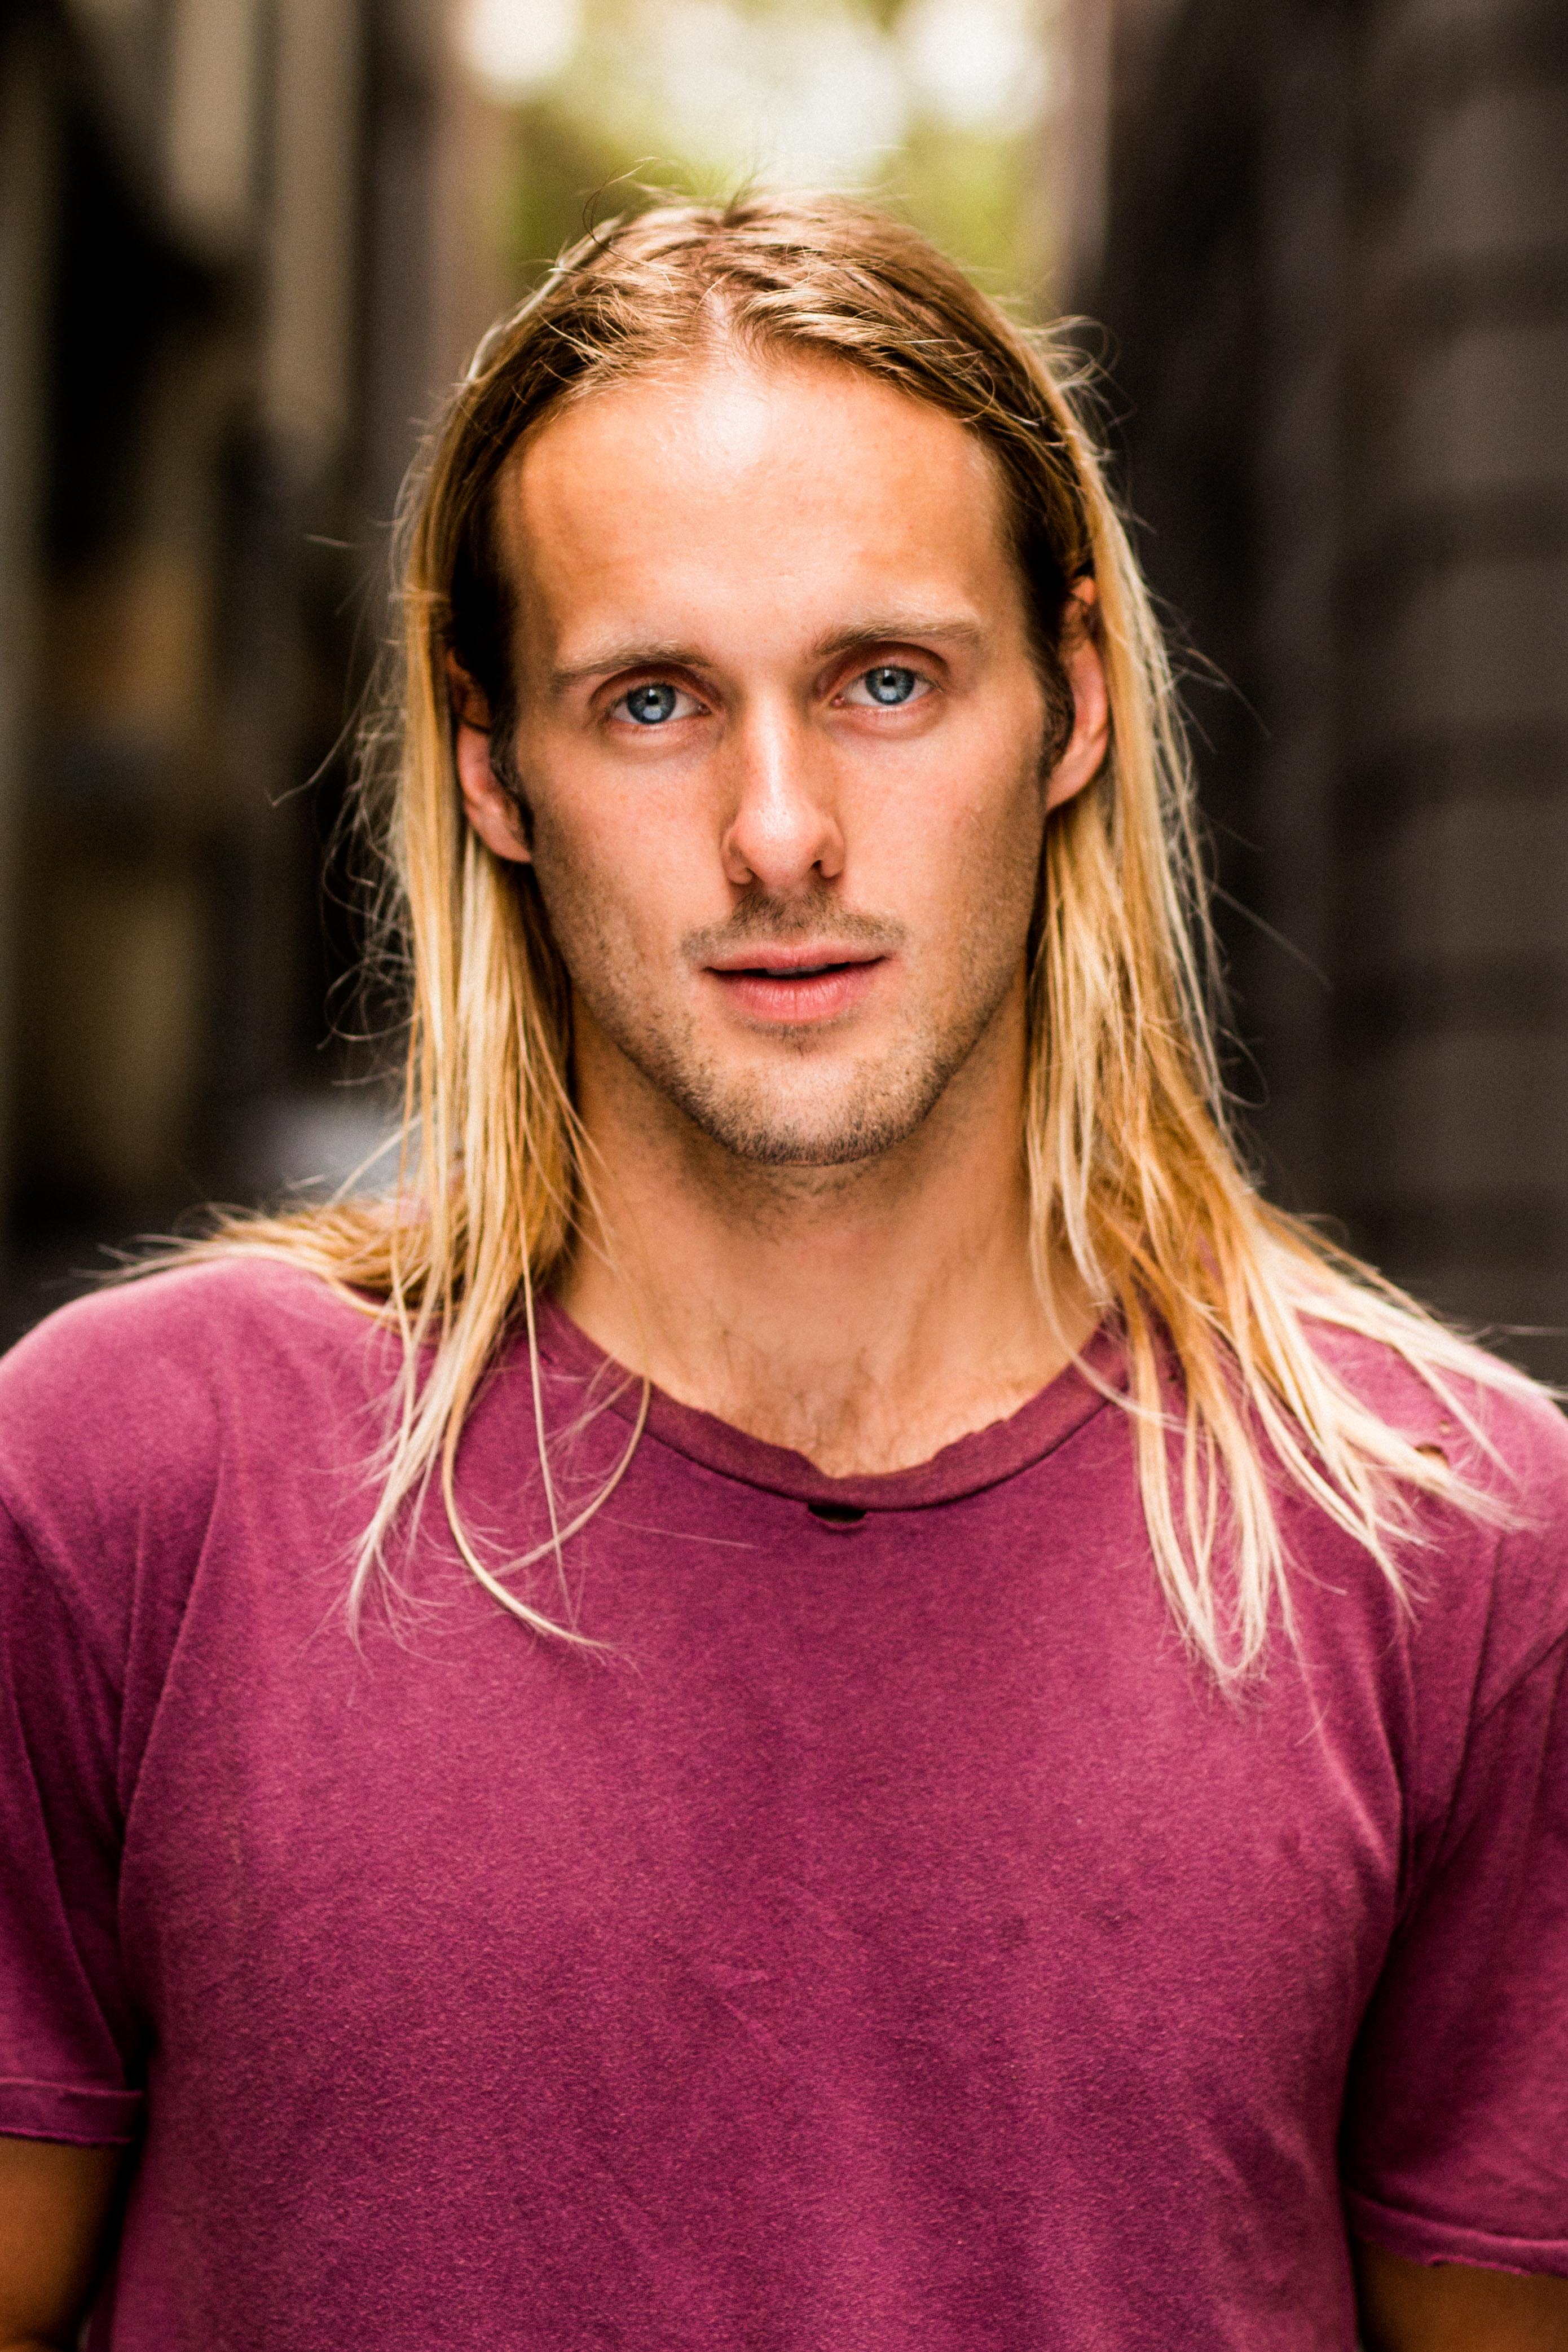 Rhys Johnson